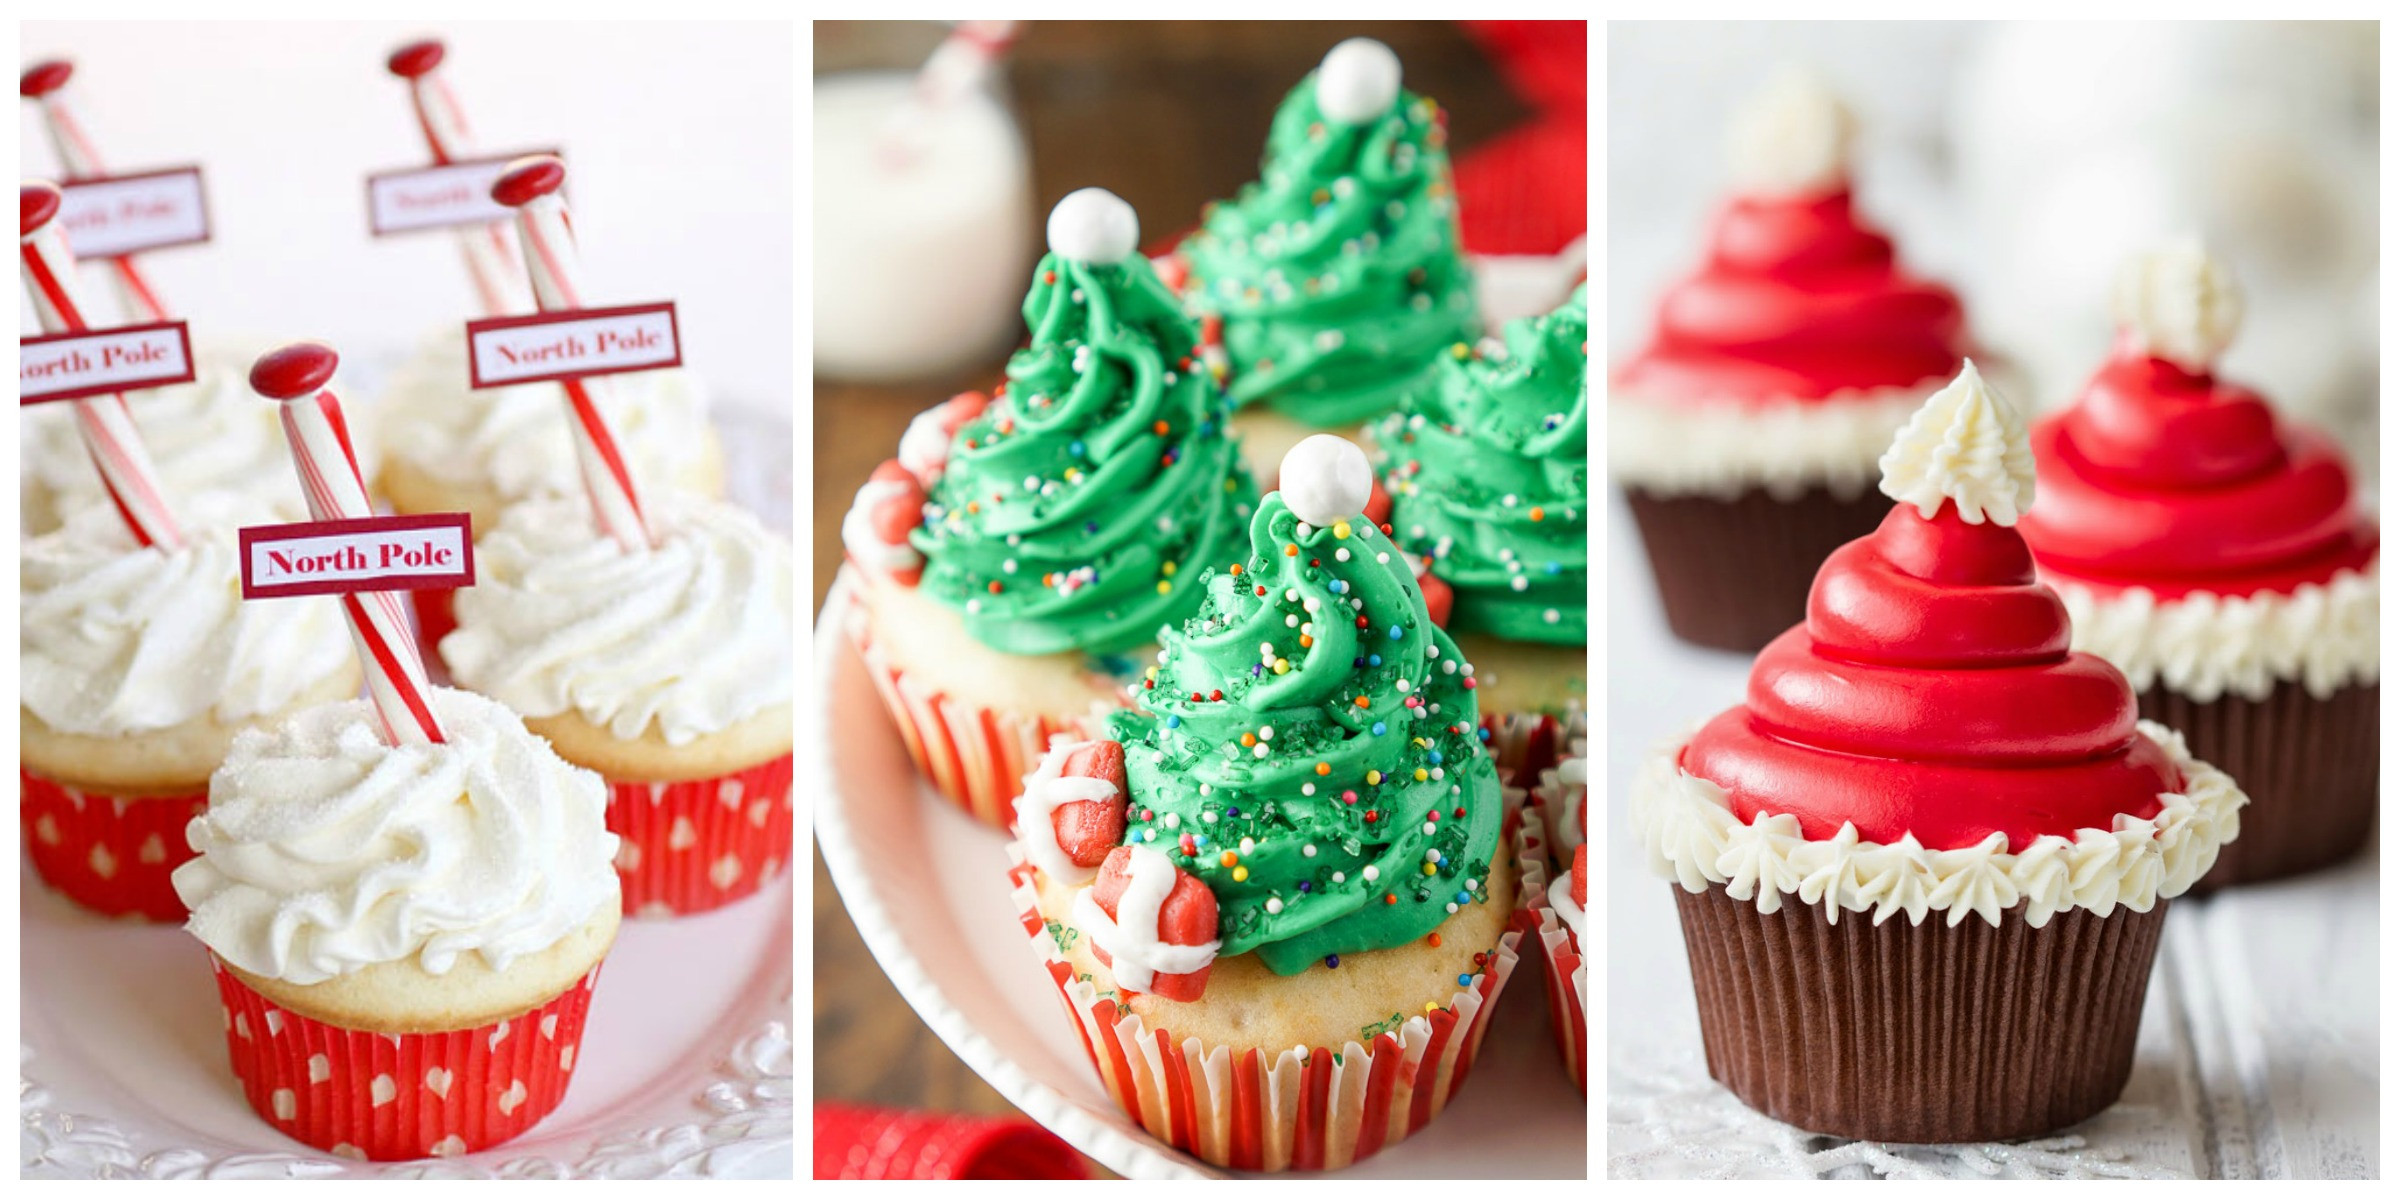 Christmas Cup Cakes Designs  19 Christmas Cupcakes Cupcake Decorating Ideas